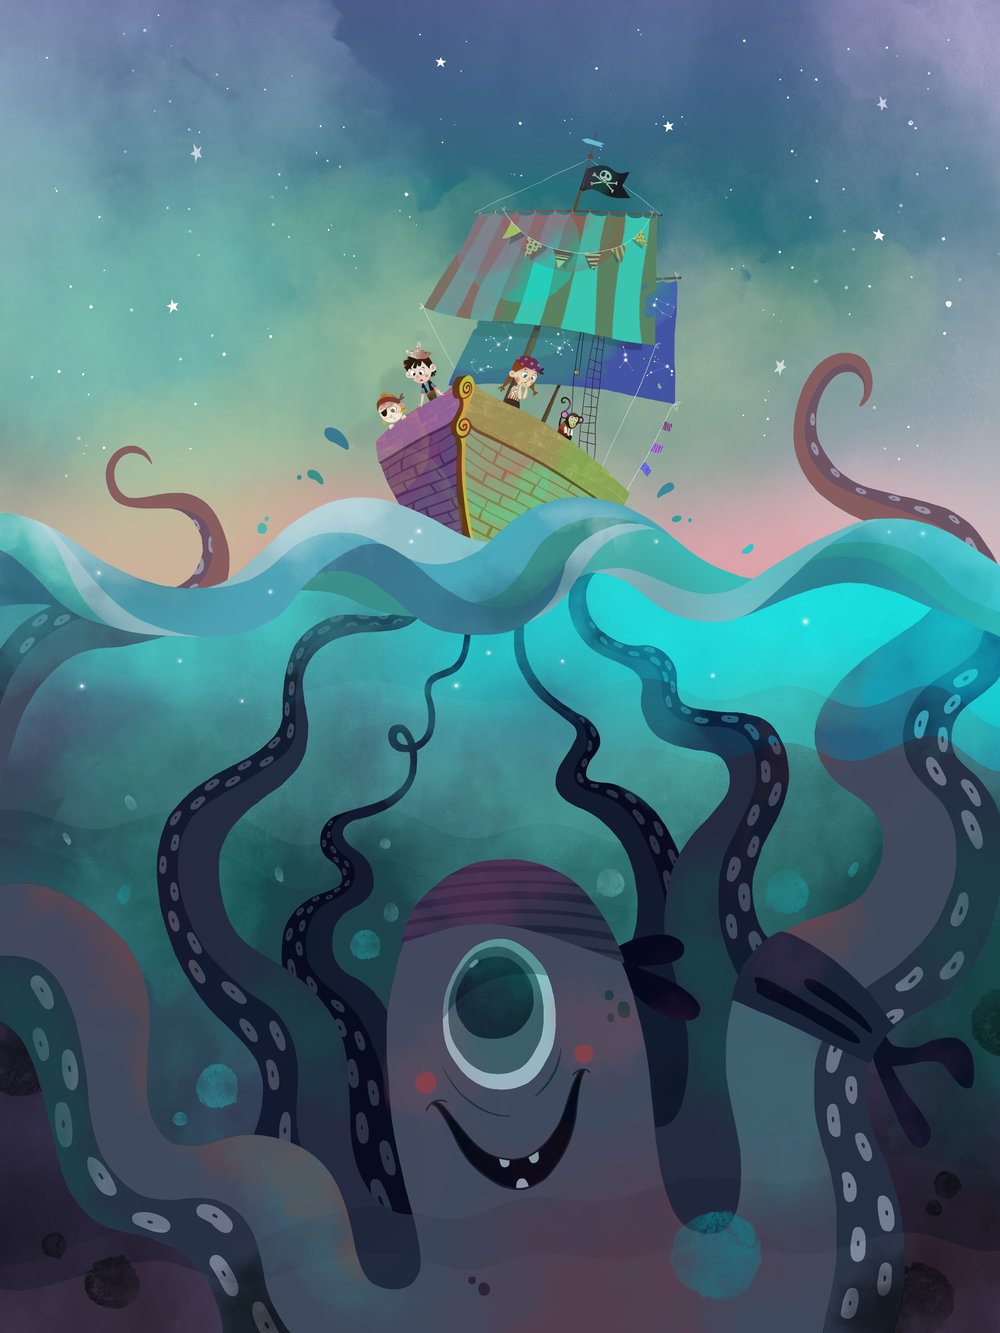 Octopus by Èlia Meraki ©